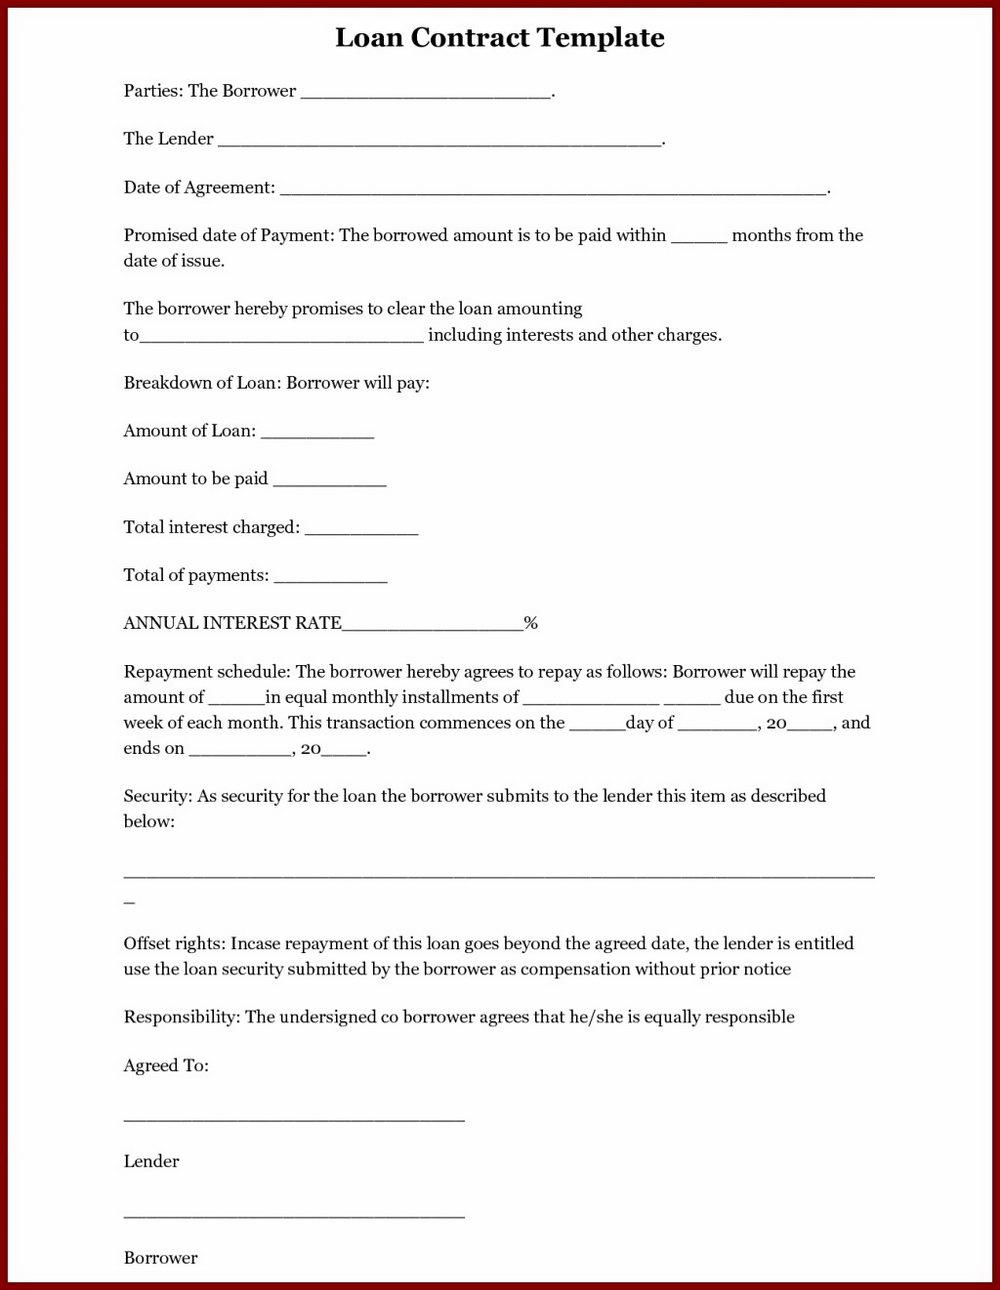 Shareholder Loan Agreement Template